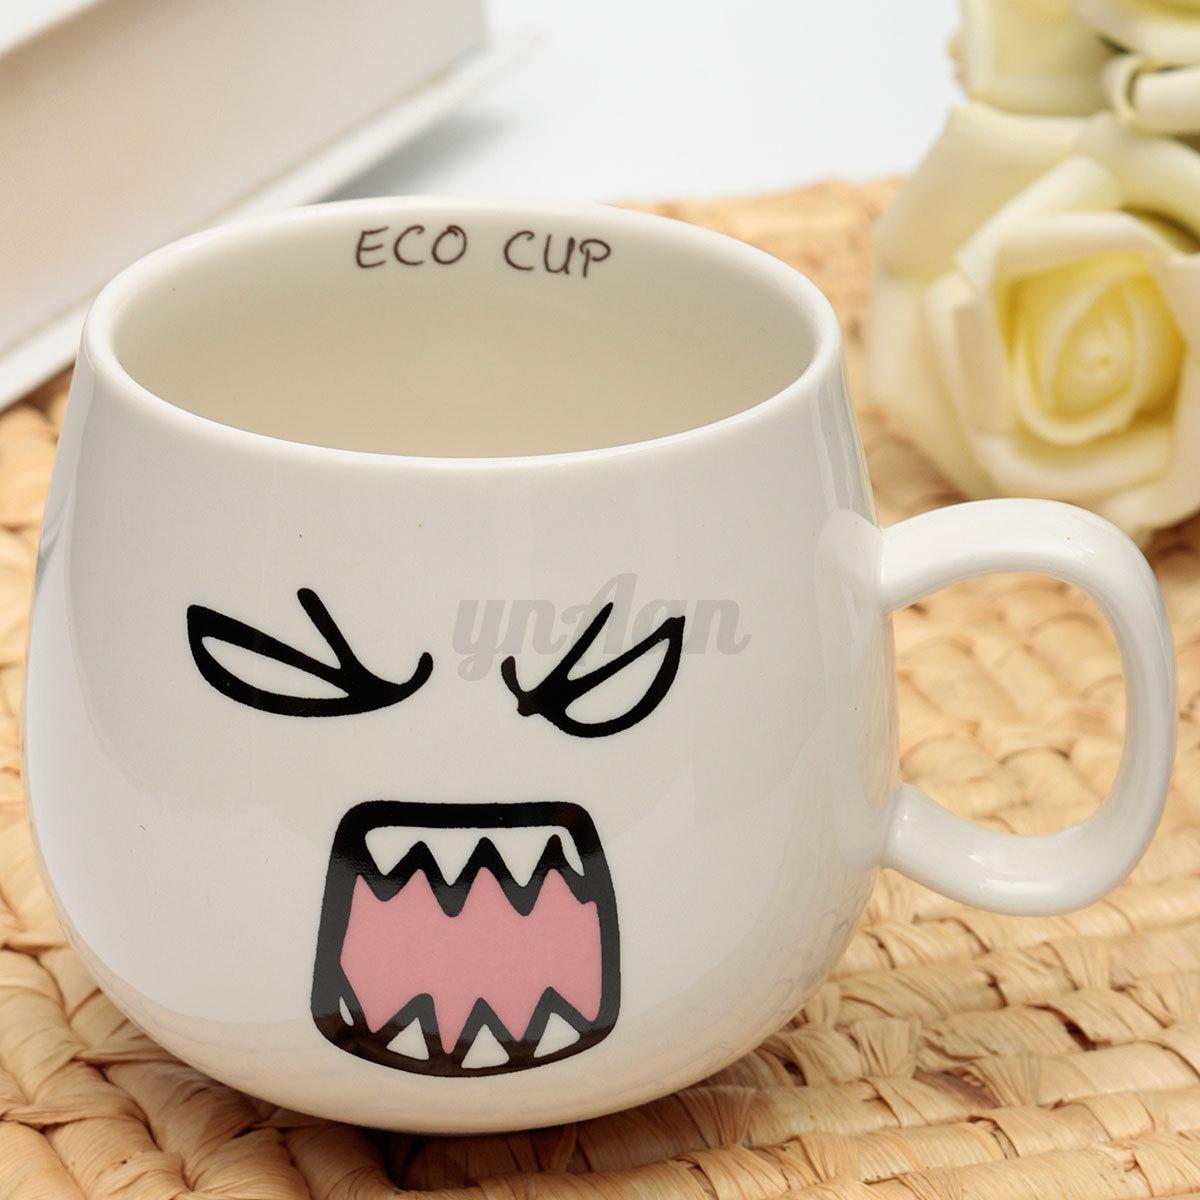 300ml Lovely Cute Face White Pottery Ceramic Cup Tea Coffee Milk Mug Gift